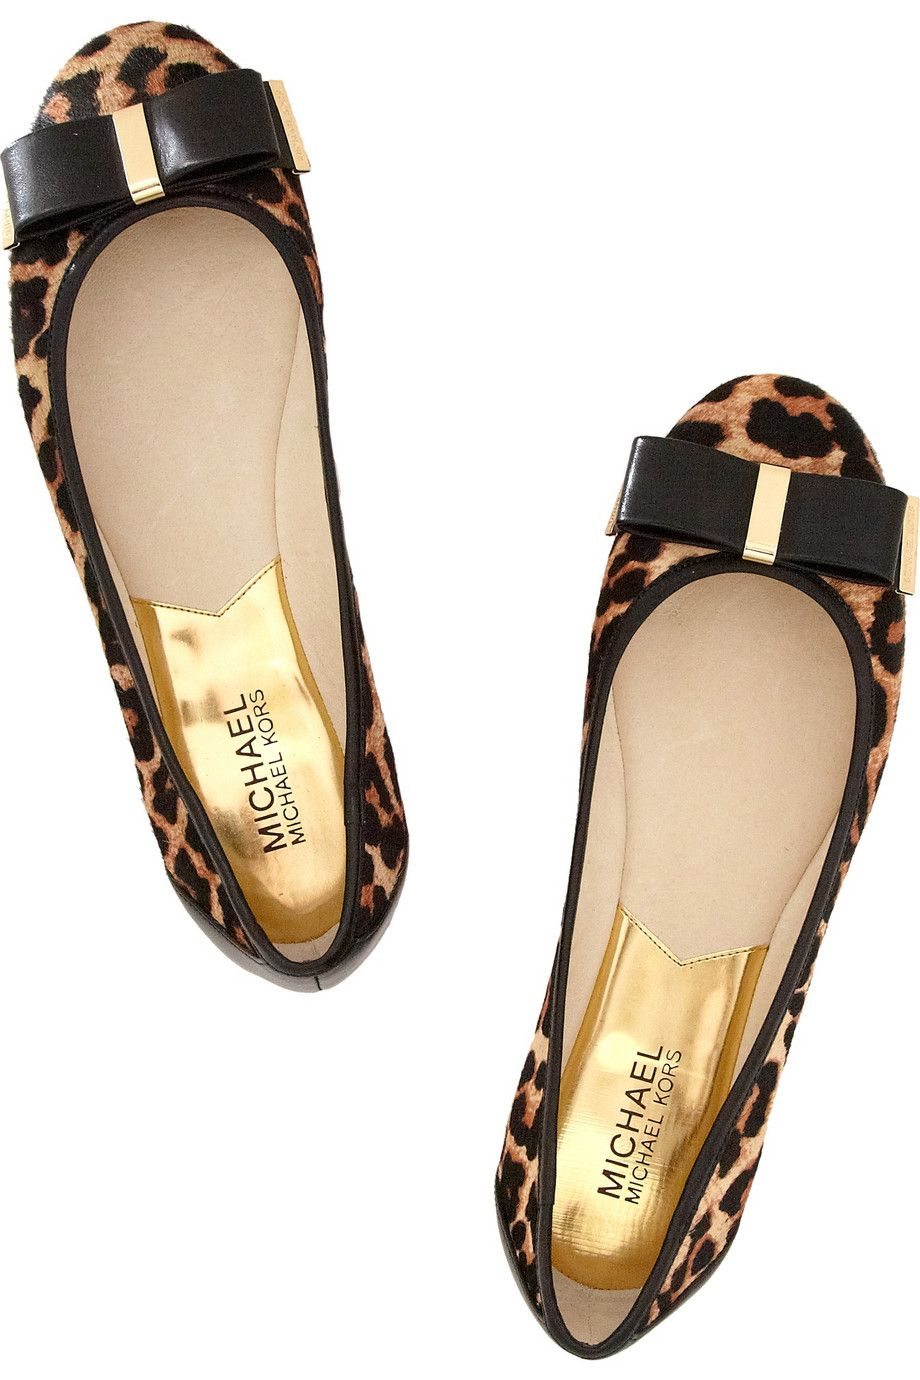 michael michael kors kiera leopard print calf hair ballet flats net a porter com things to. Black Bedroom Furniture Sets. Home Design Ideas